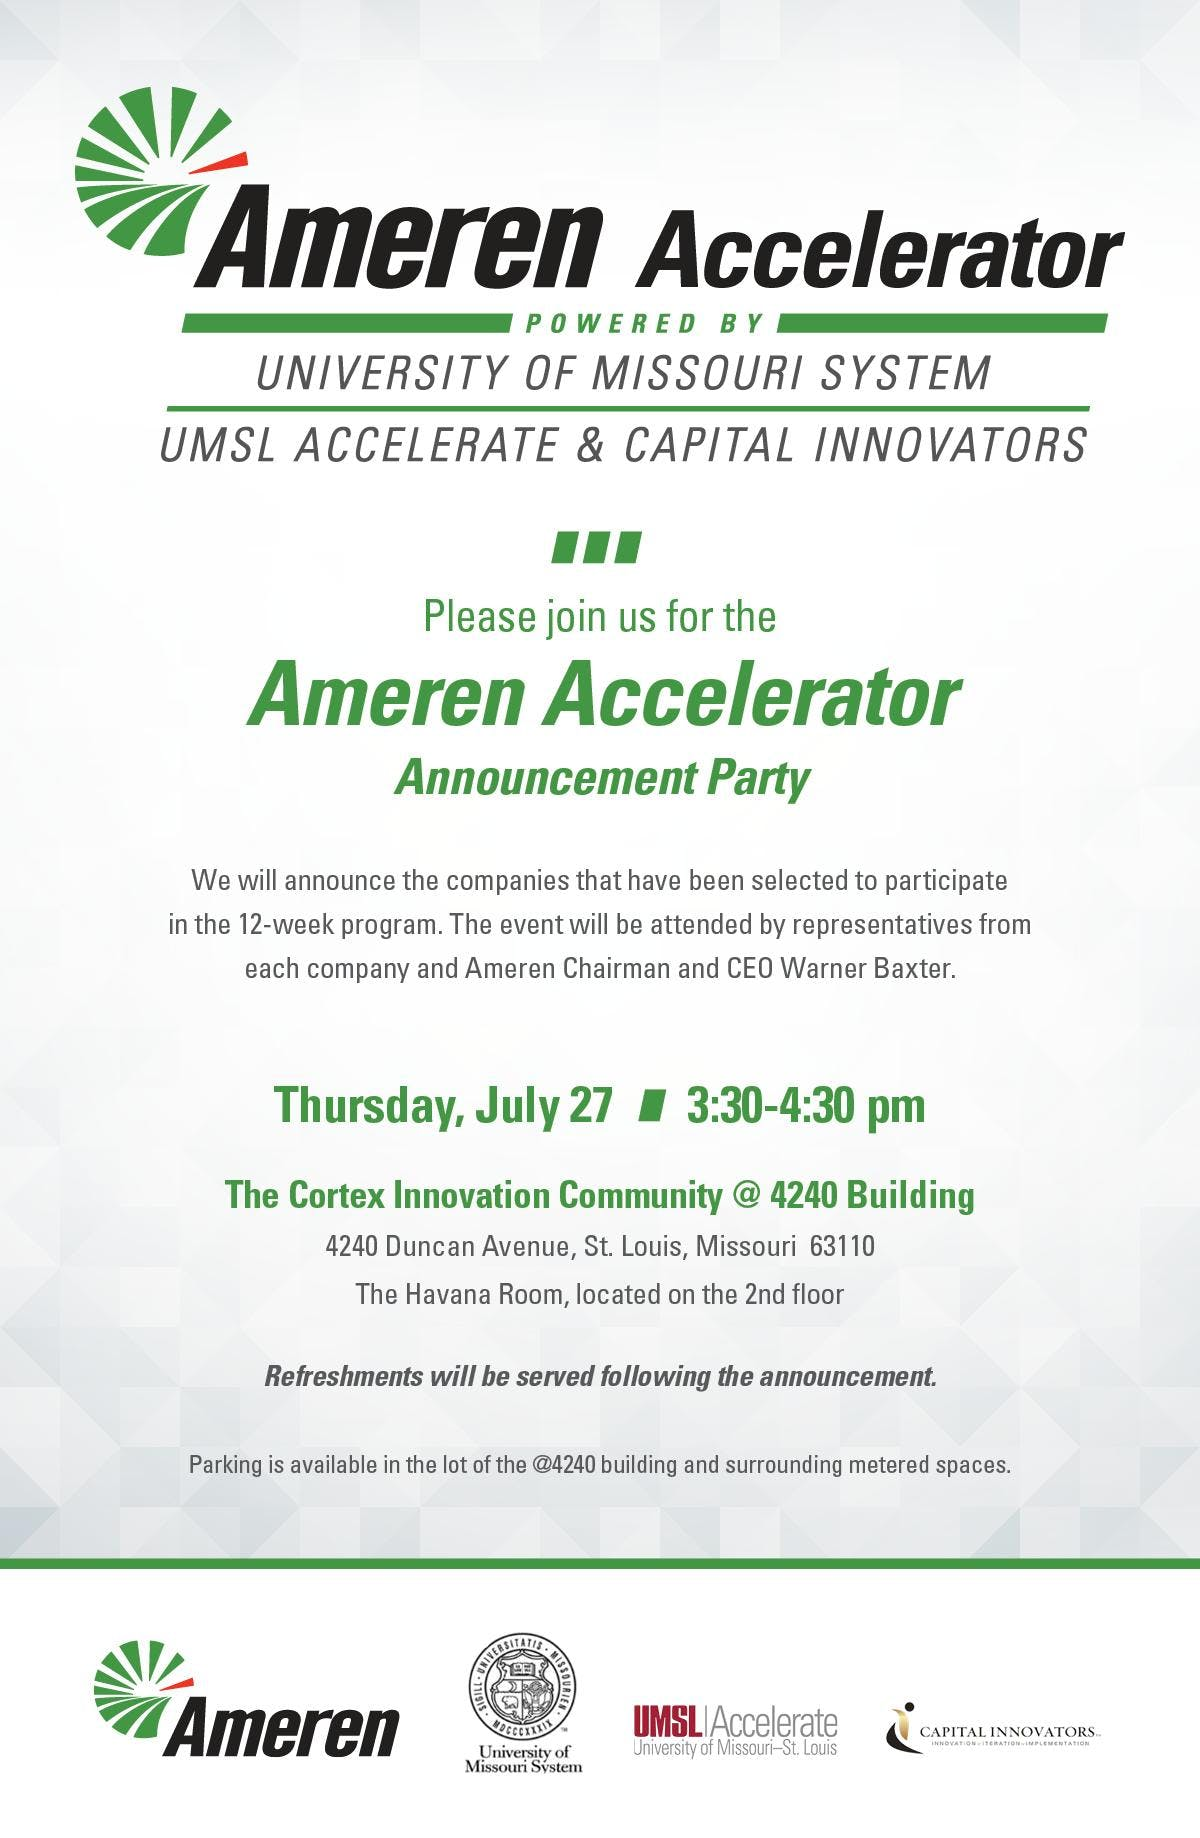 Ameren Accelerator – 2018 Announcement Party